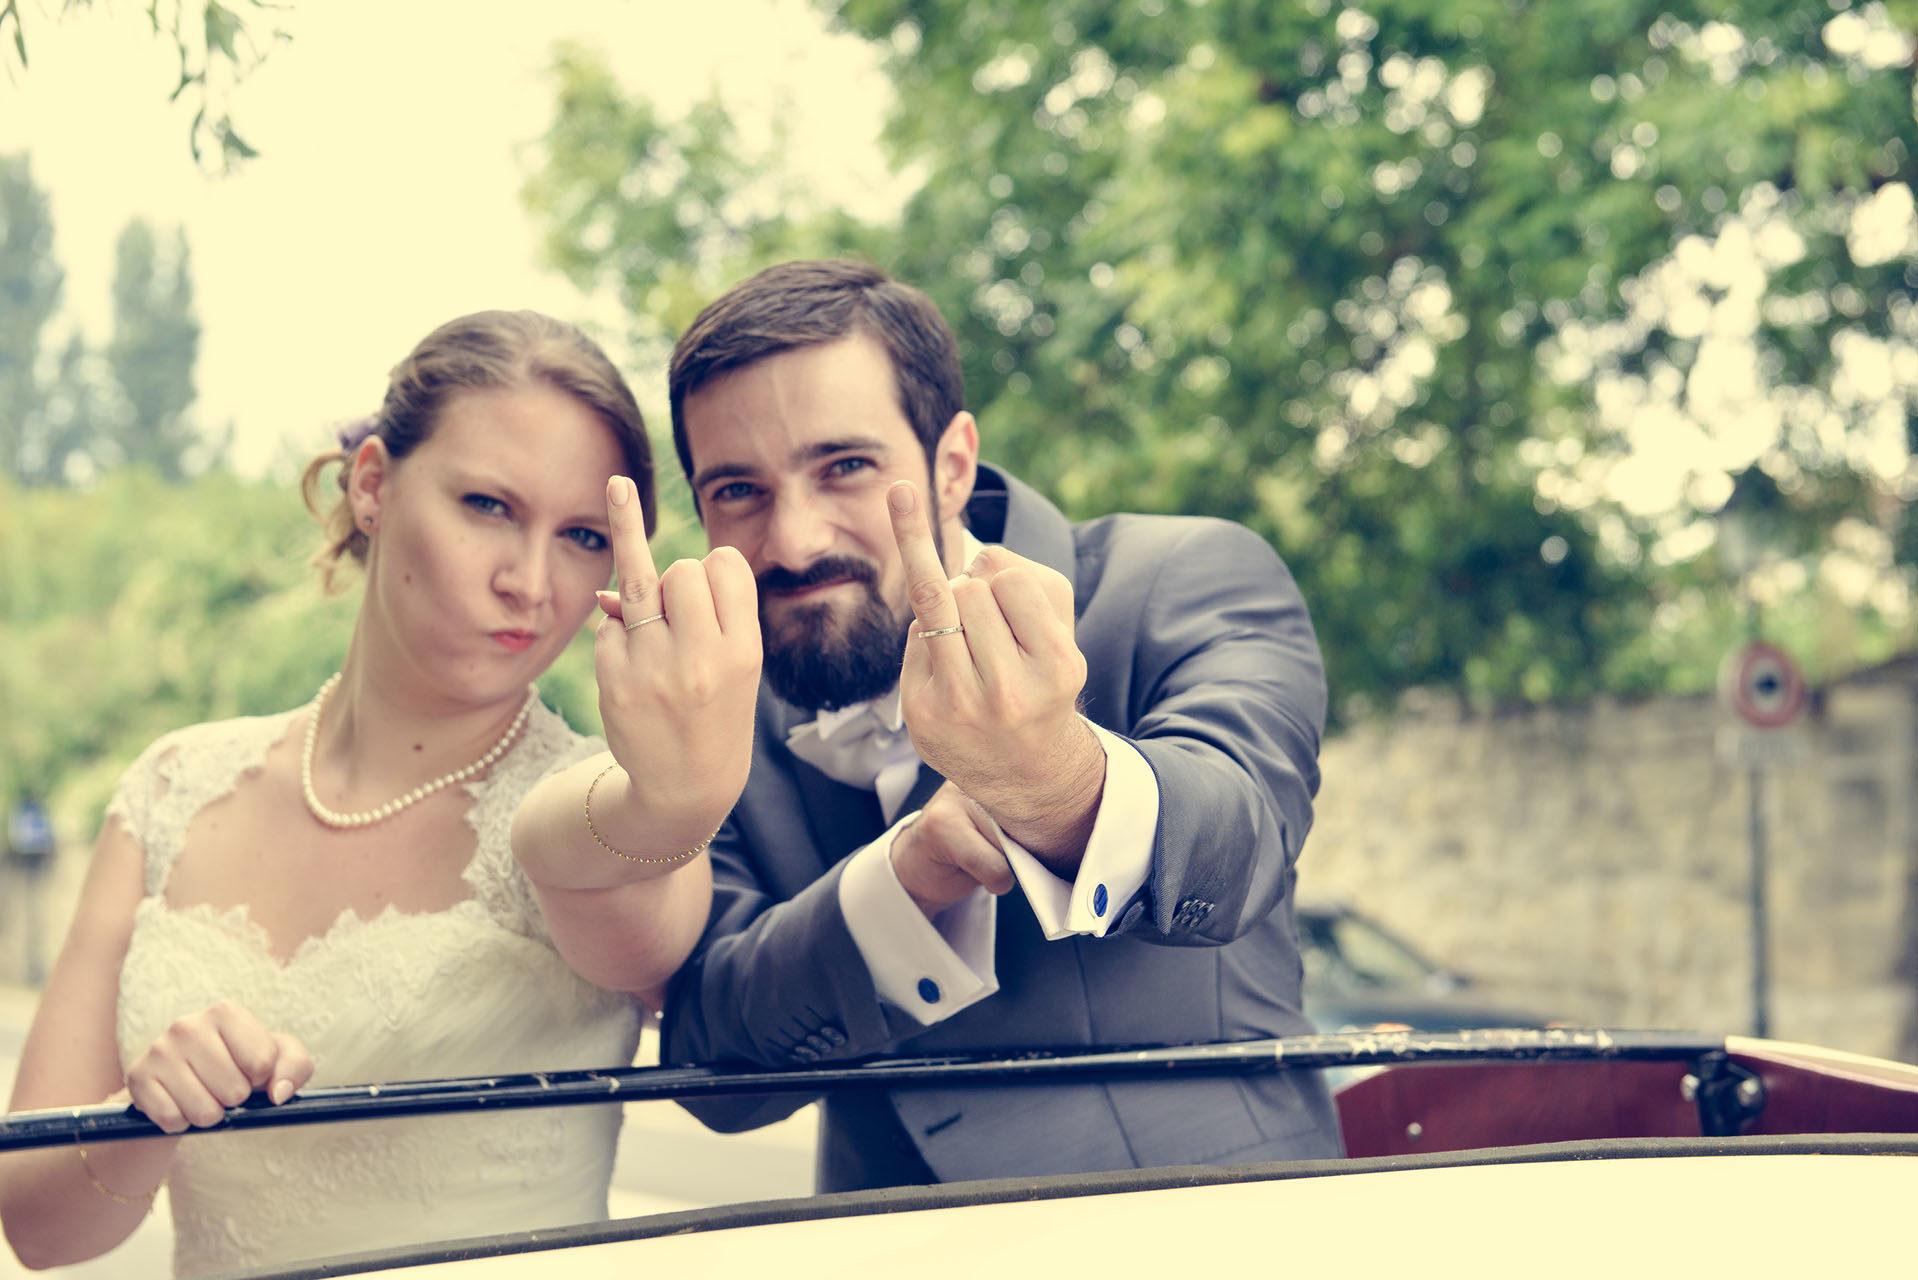 photographe-ile-de-france-mariage-val-de-marne